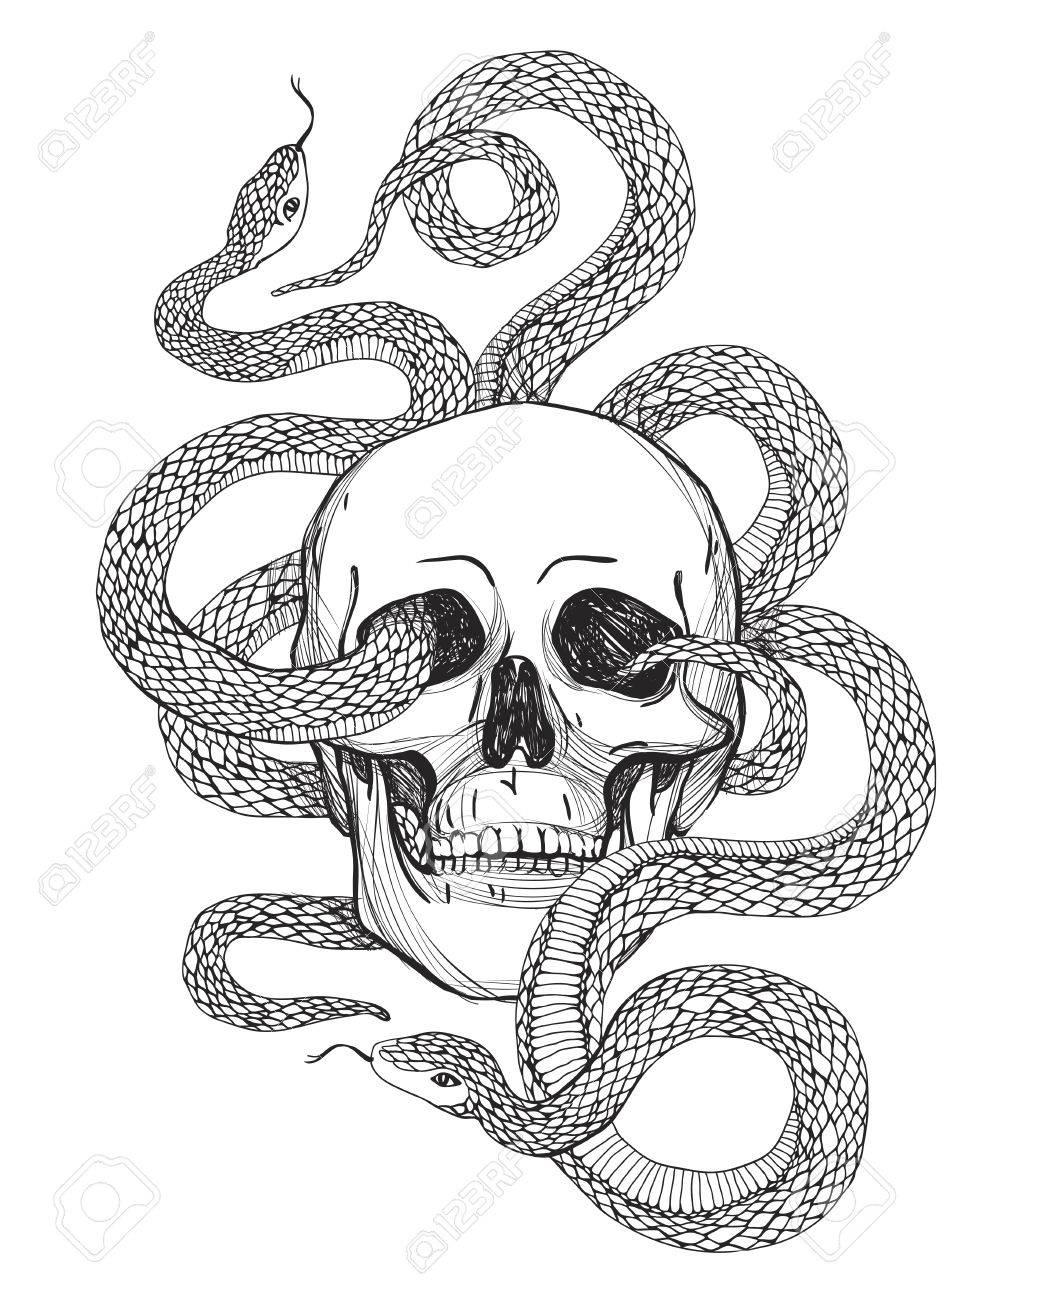 Skull and Snake. Tattoo art, coloring books. vintage illustration..